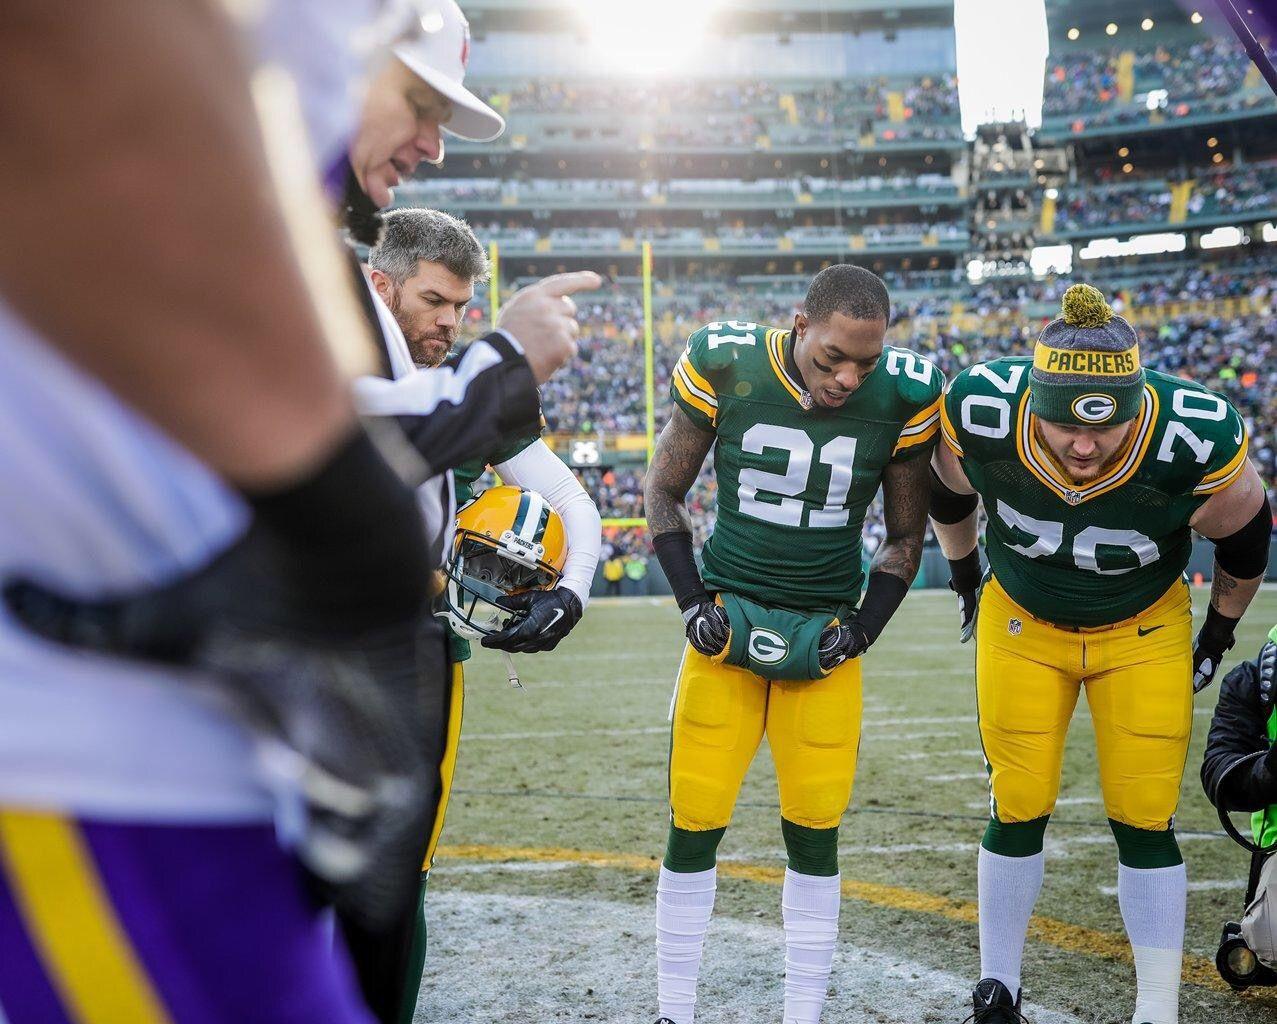 Captains Vs The Vikings Vikings Captain Green Bay Packers